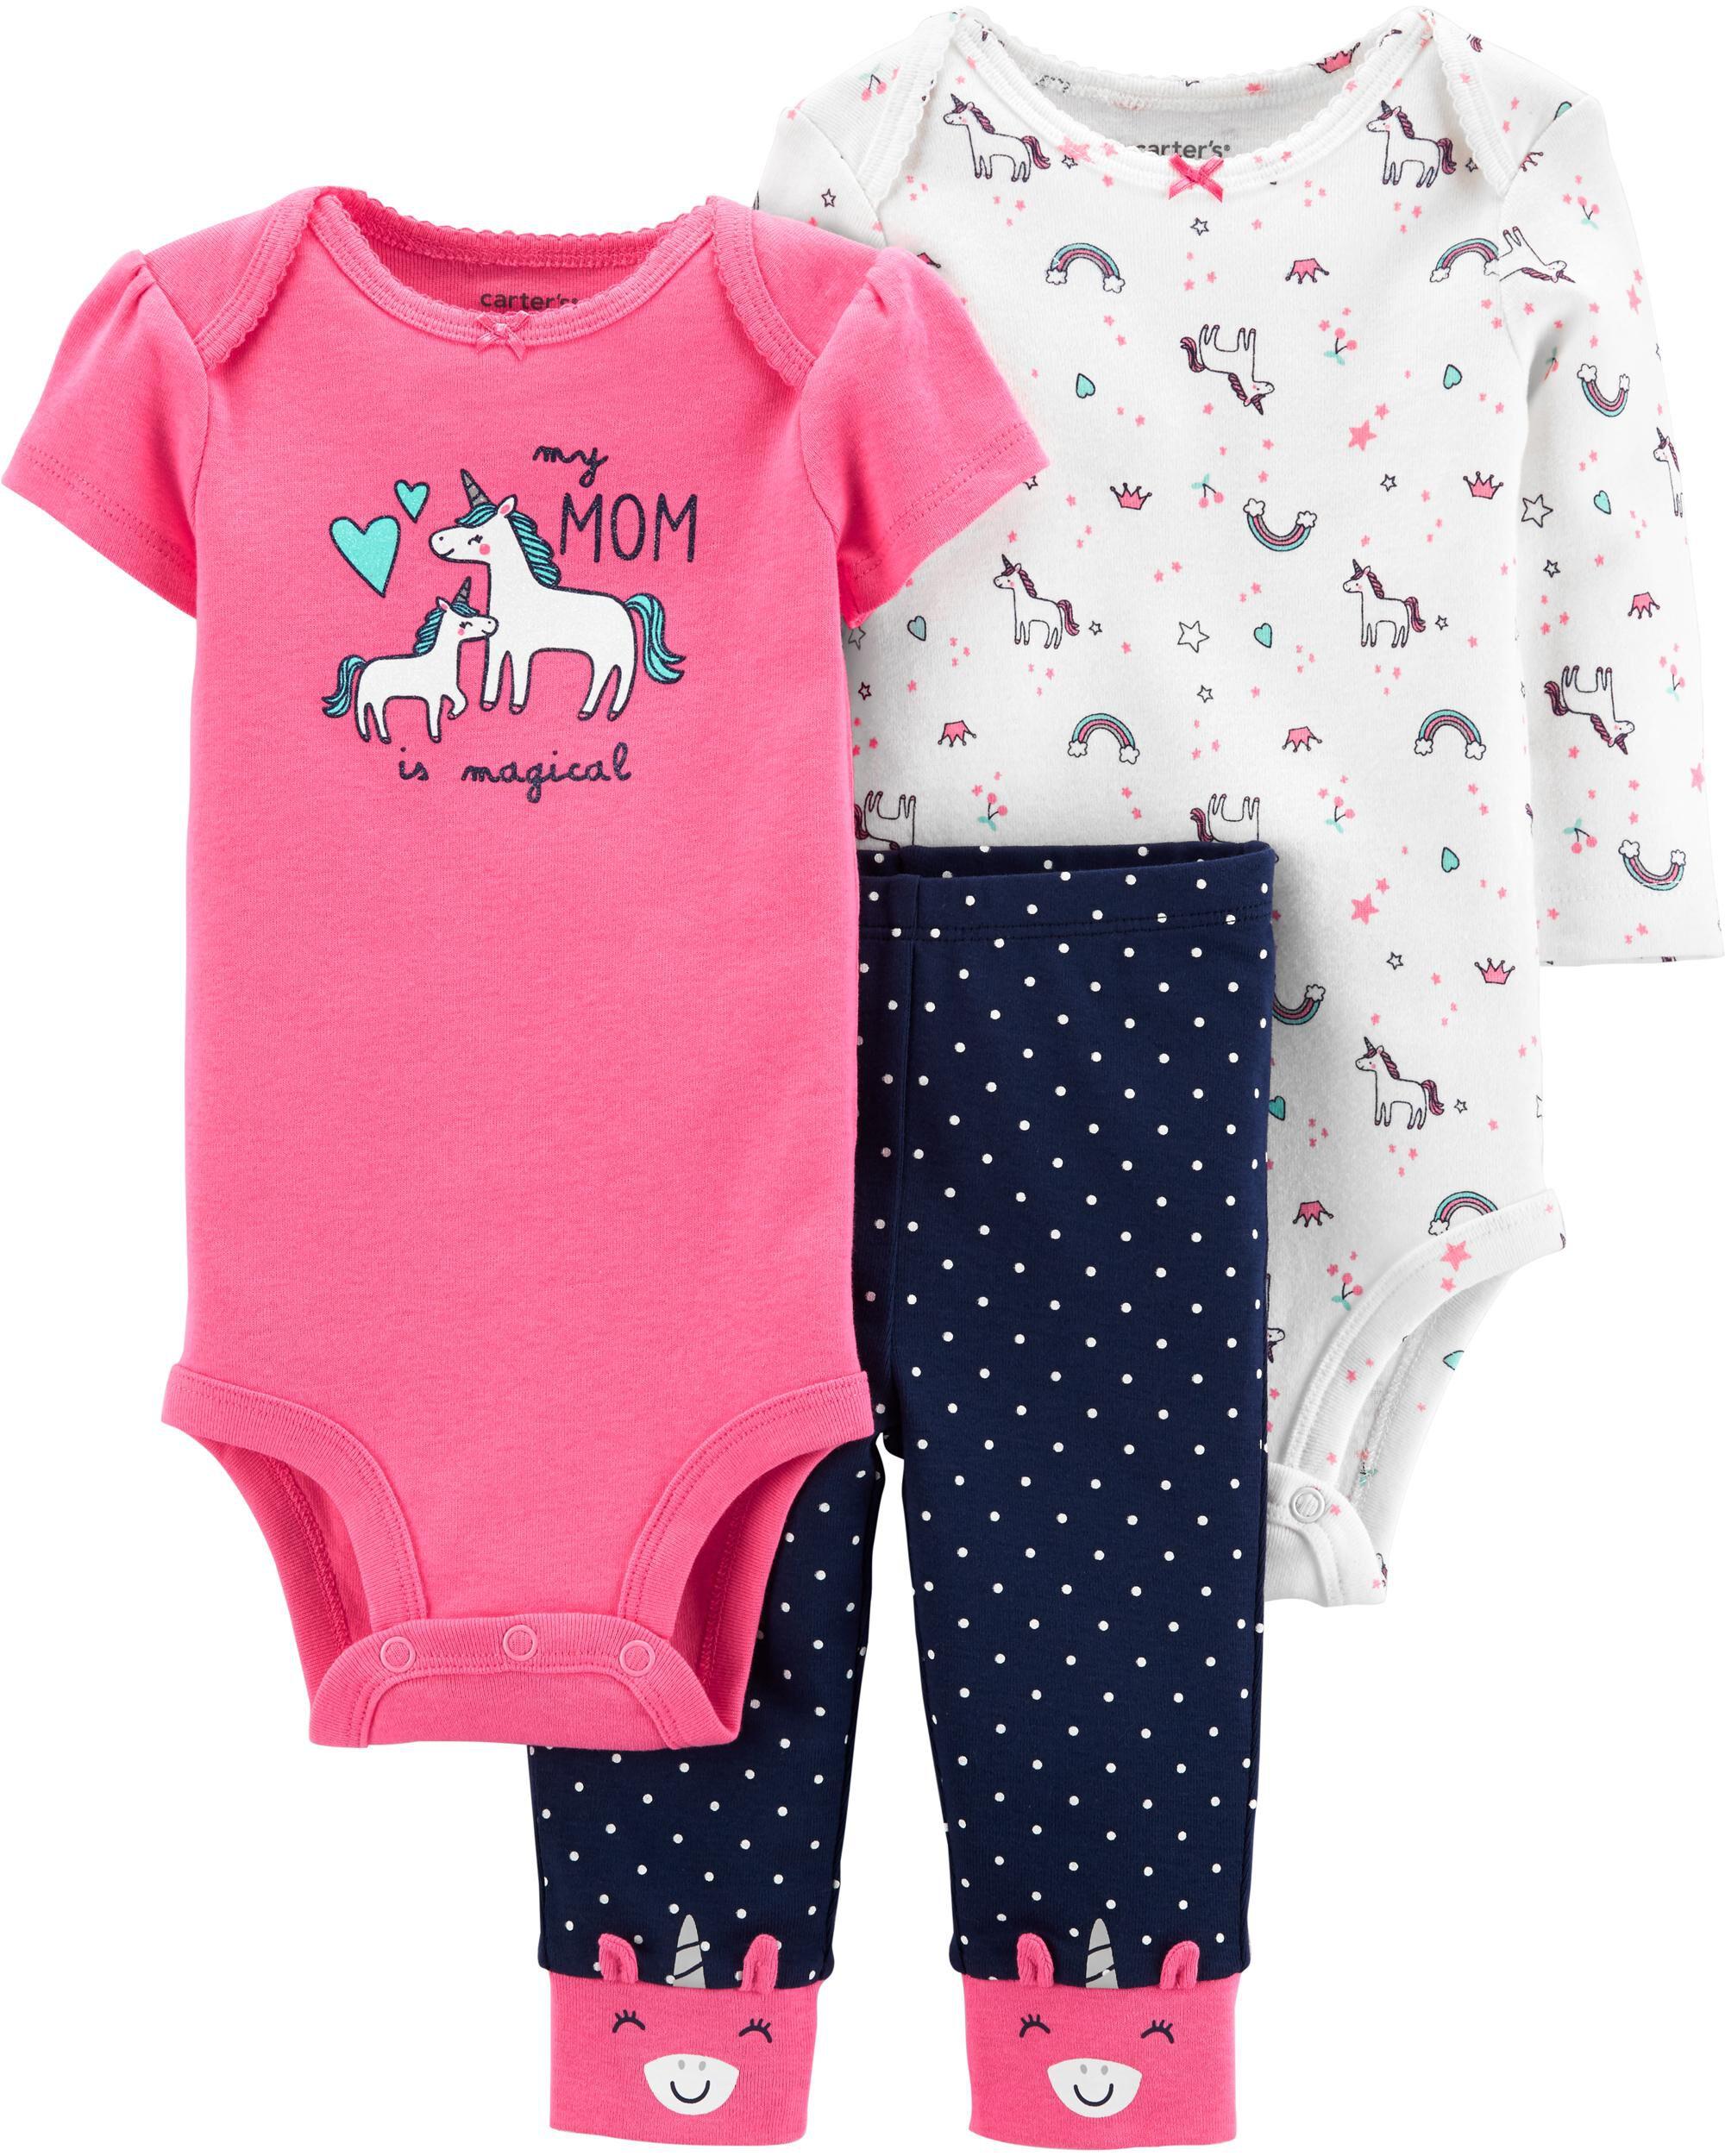 Carters Baby-Girls Newborn 3 Pack Holiday Dot Socks